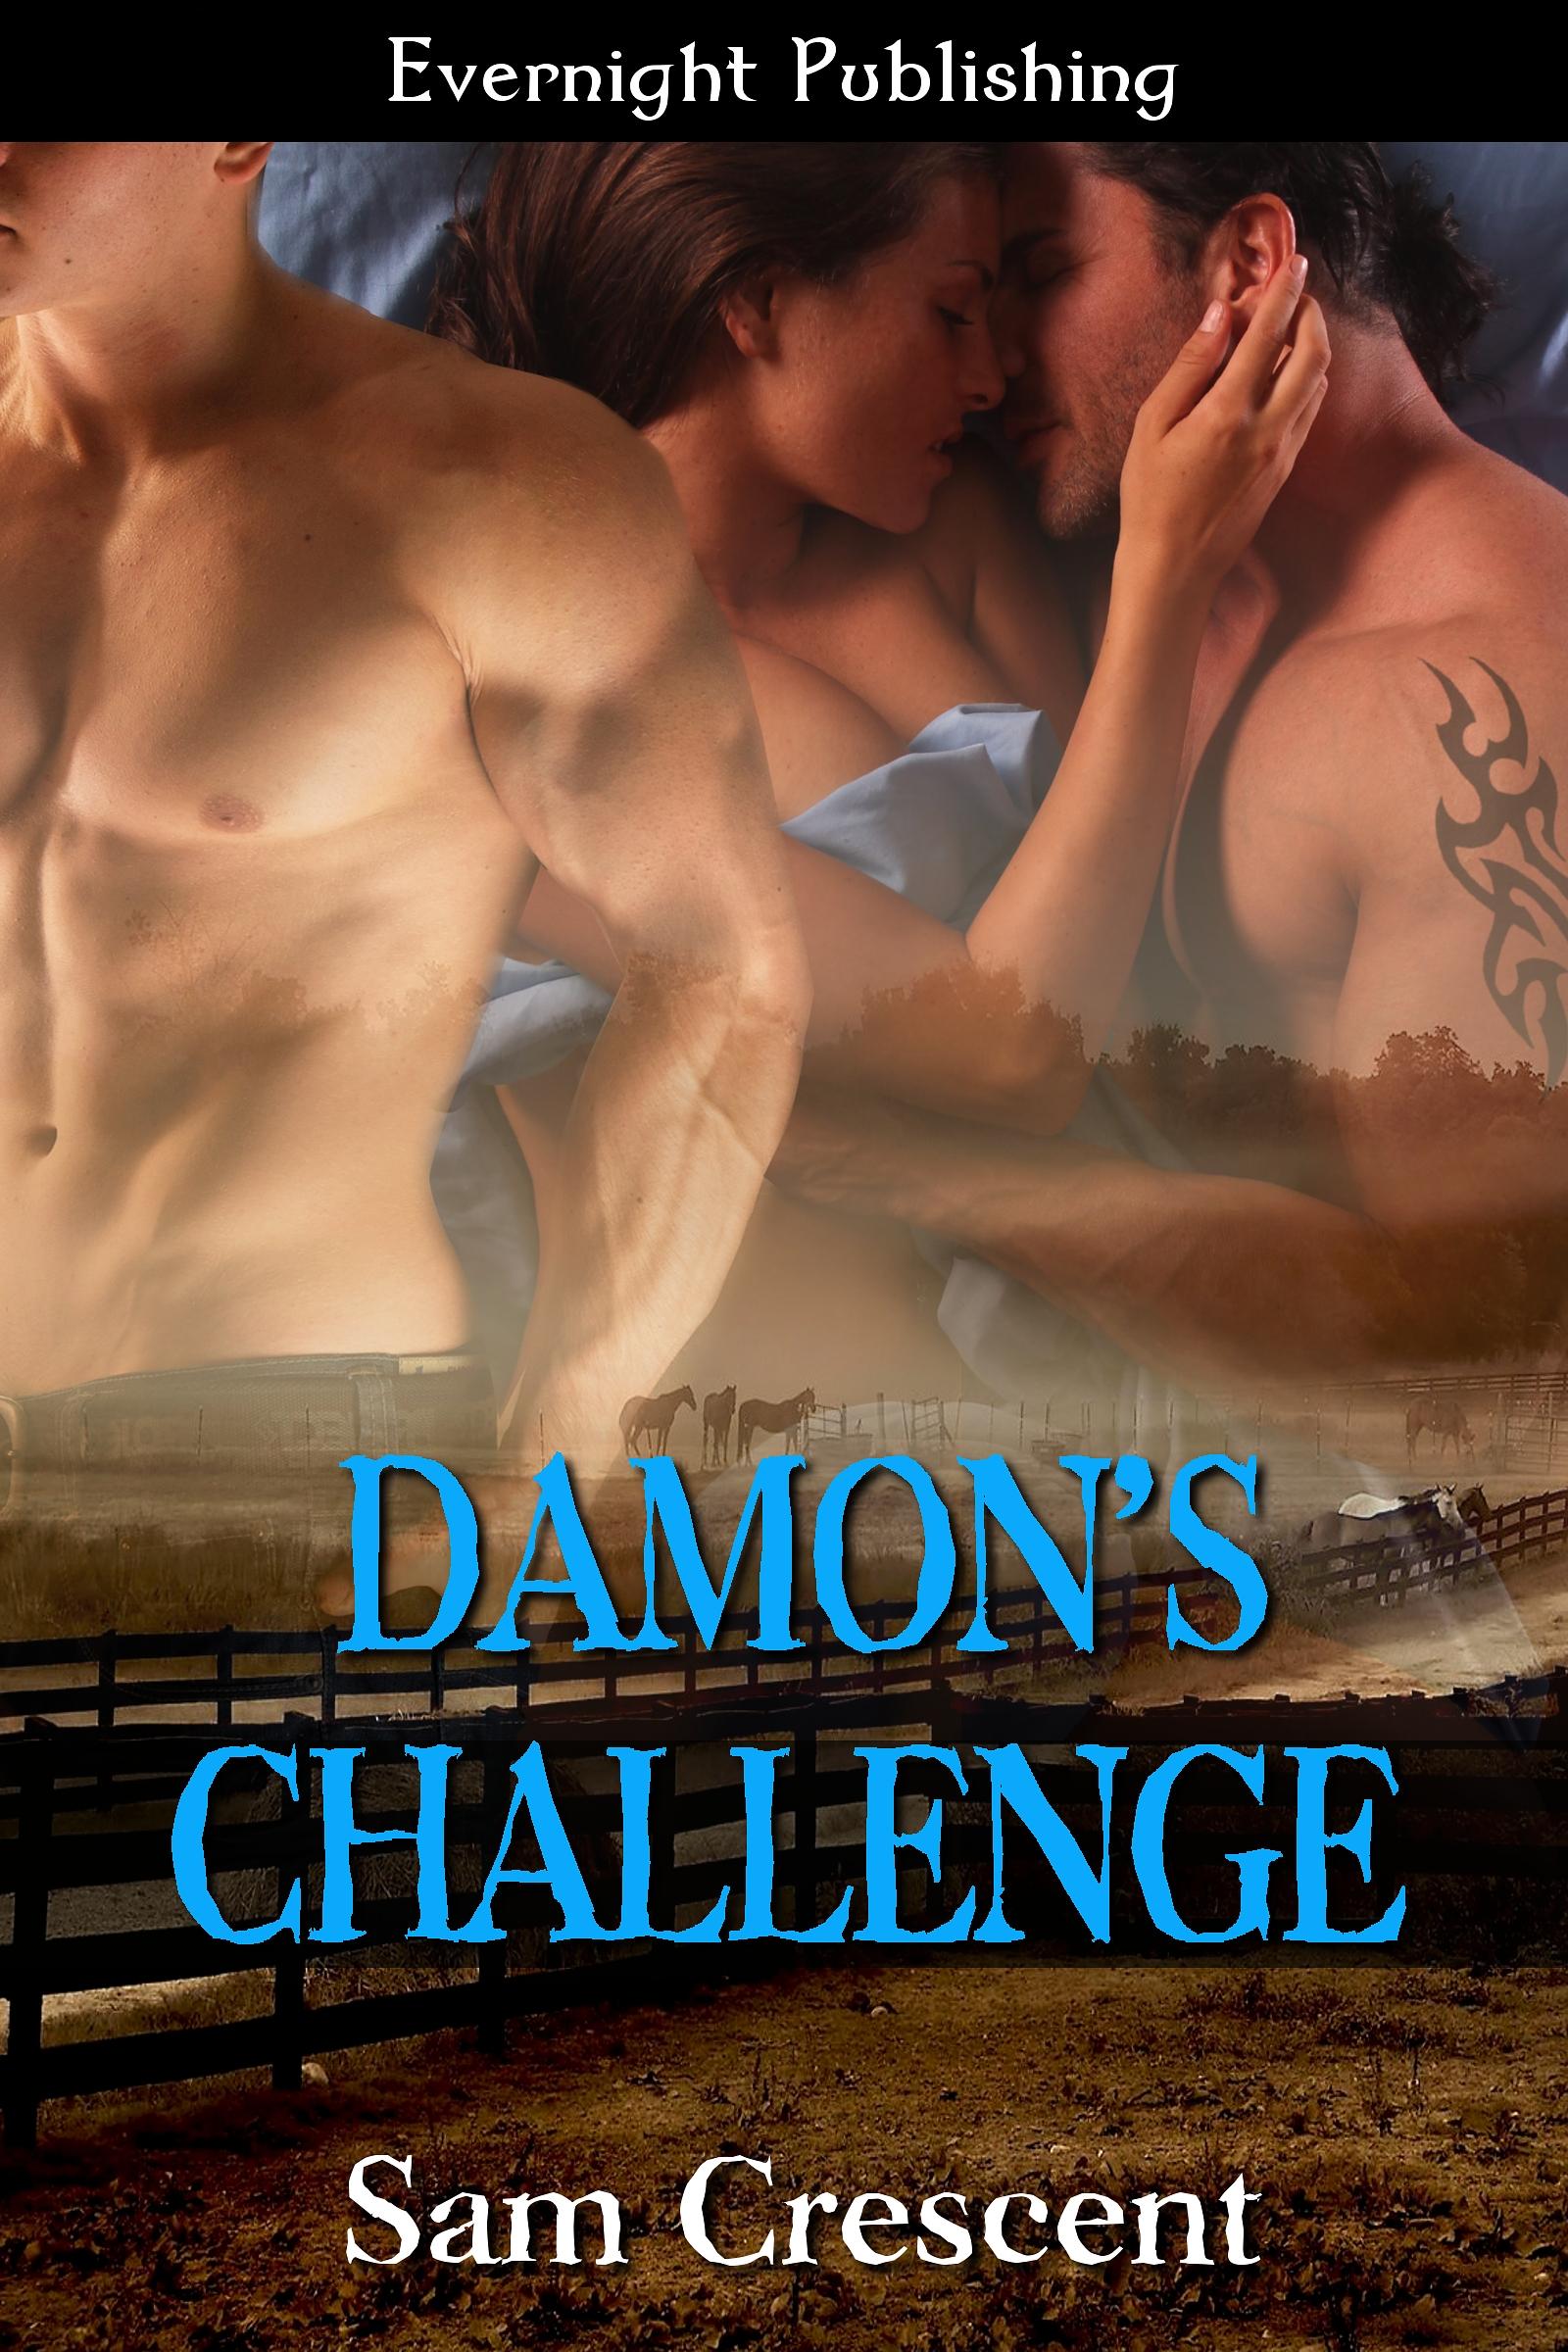 Sam Crescent - Damon's Challenge